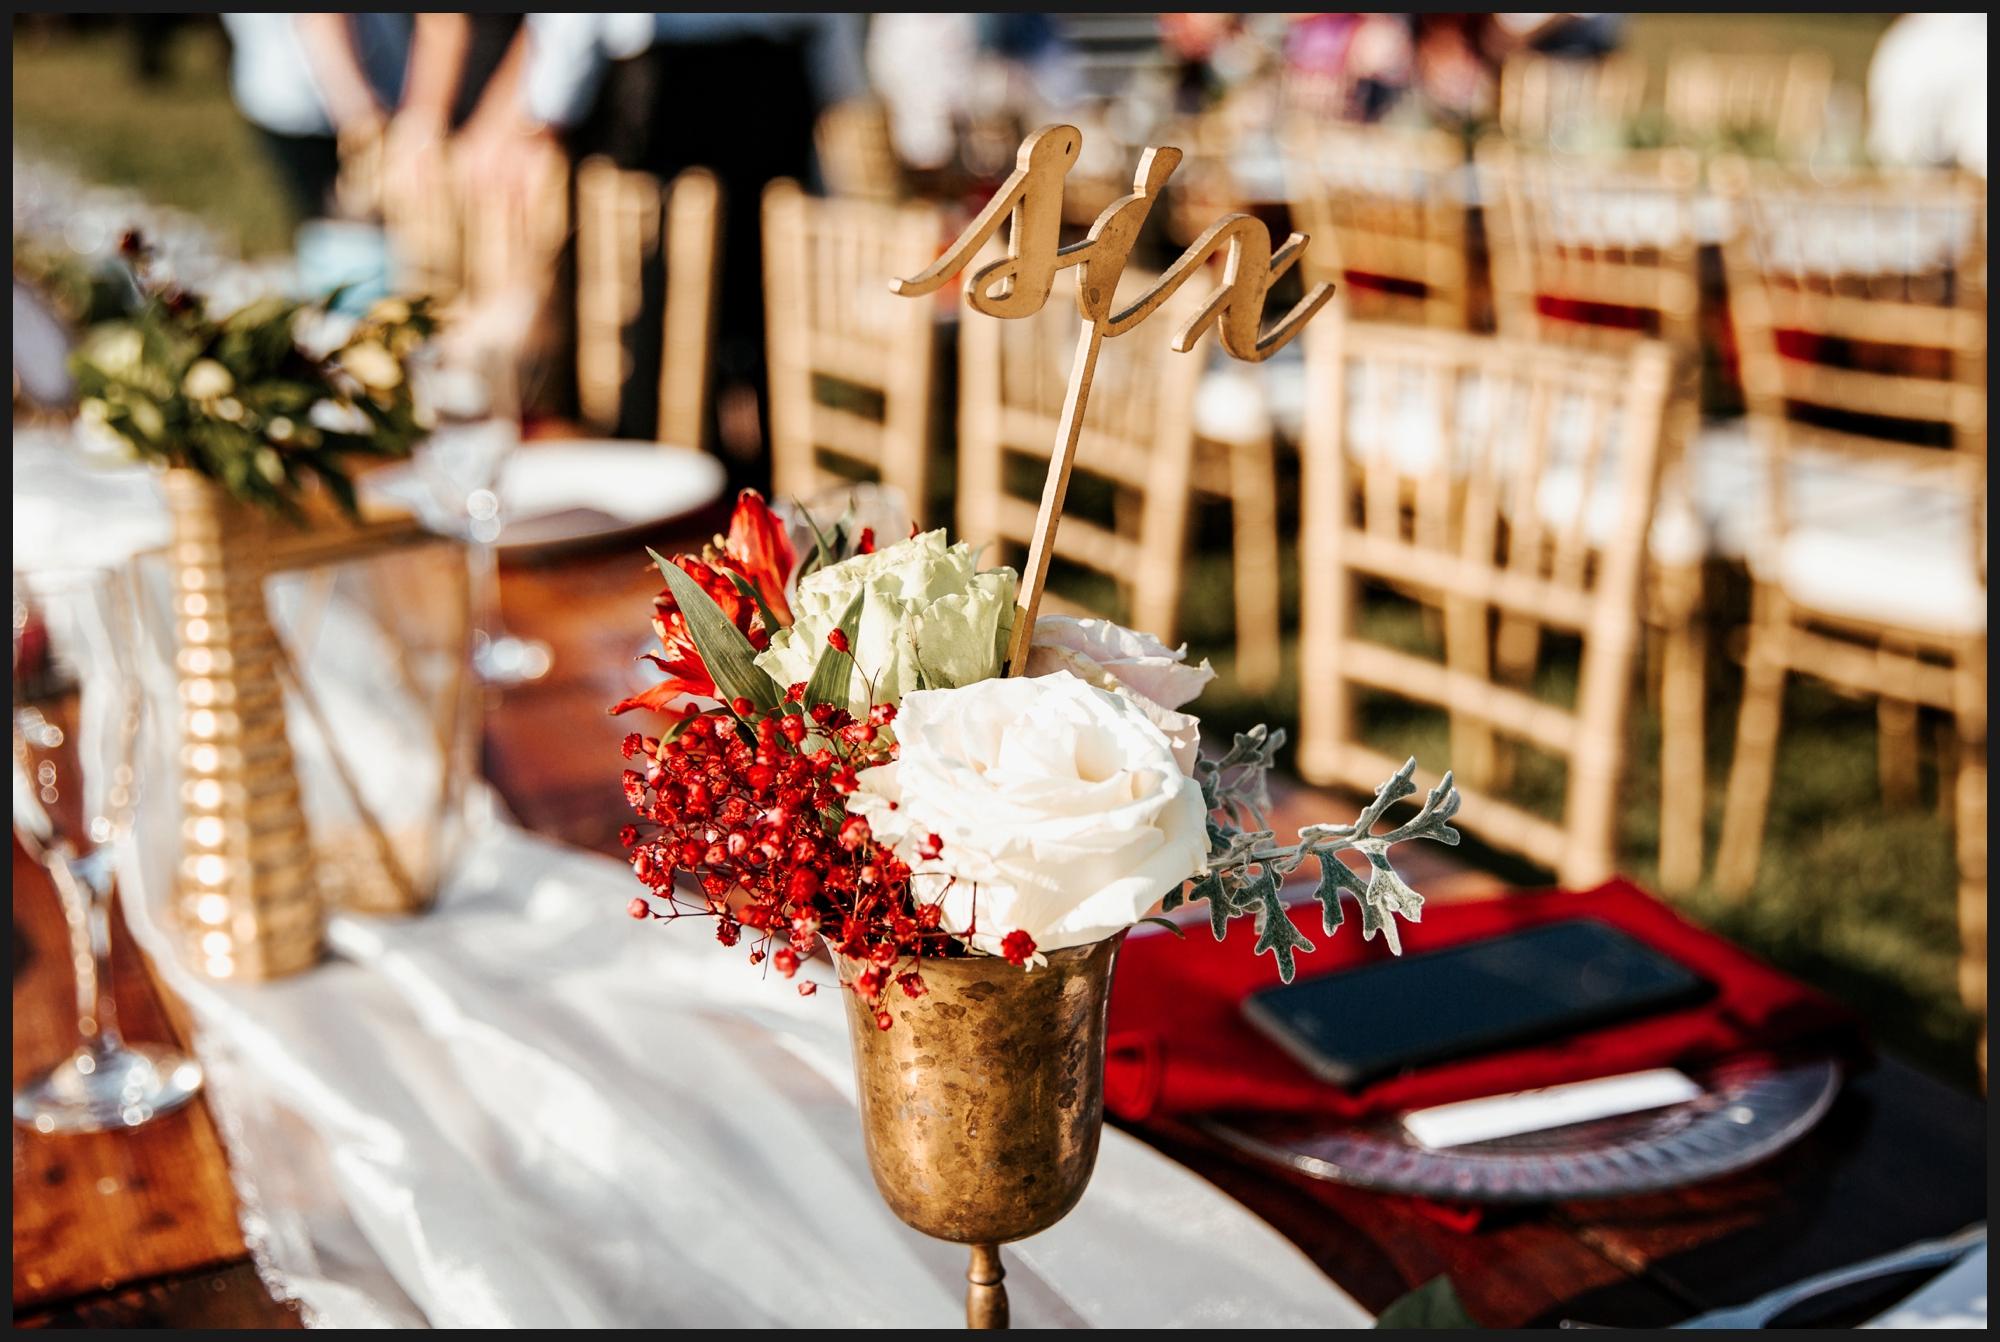 Orlando-Wedding-Photographer-destination-wedding-photographer-florida-wedding-photographer-hawaii-wedding-photographer_0604.jpg